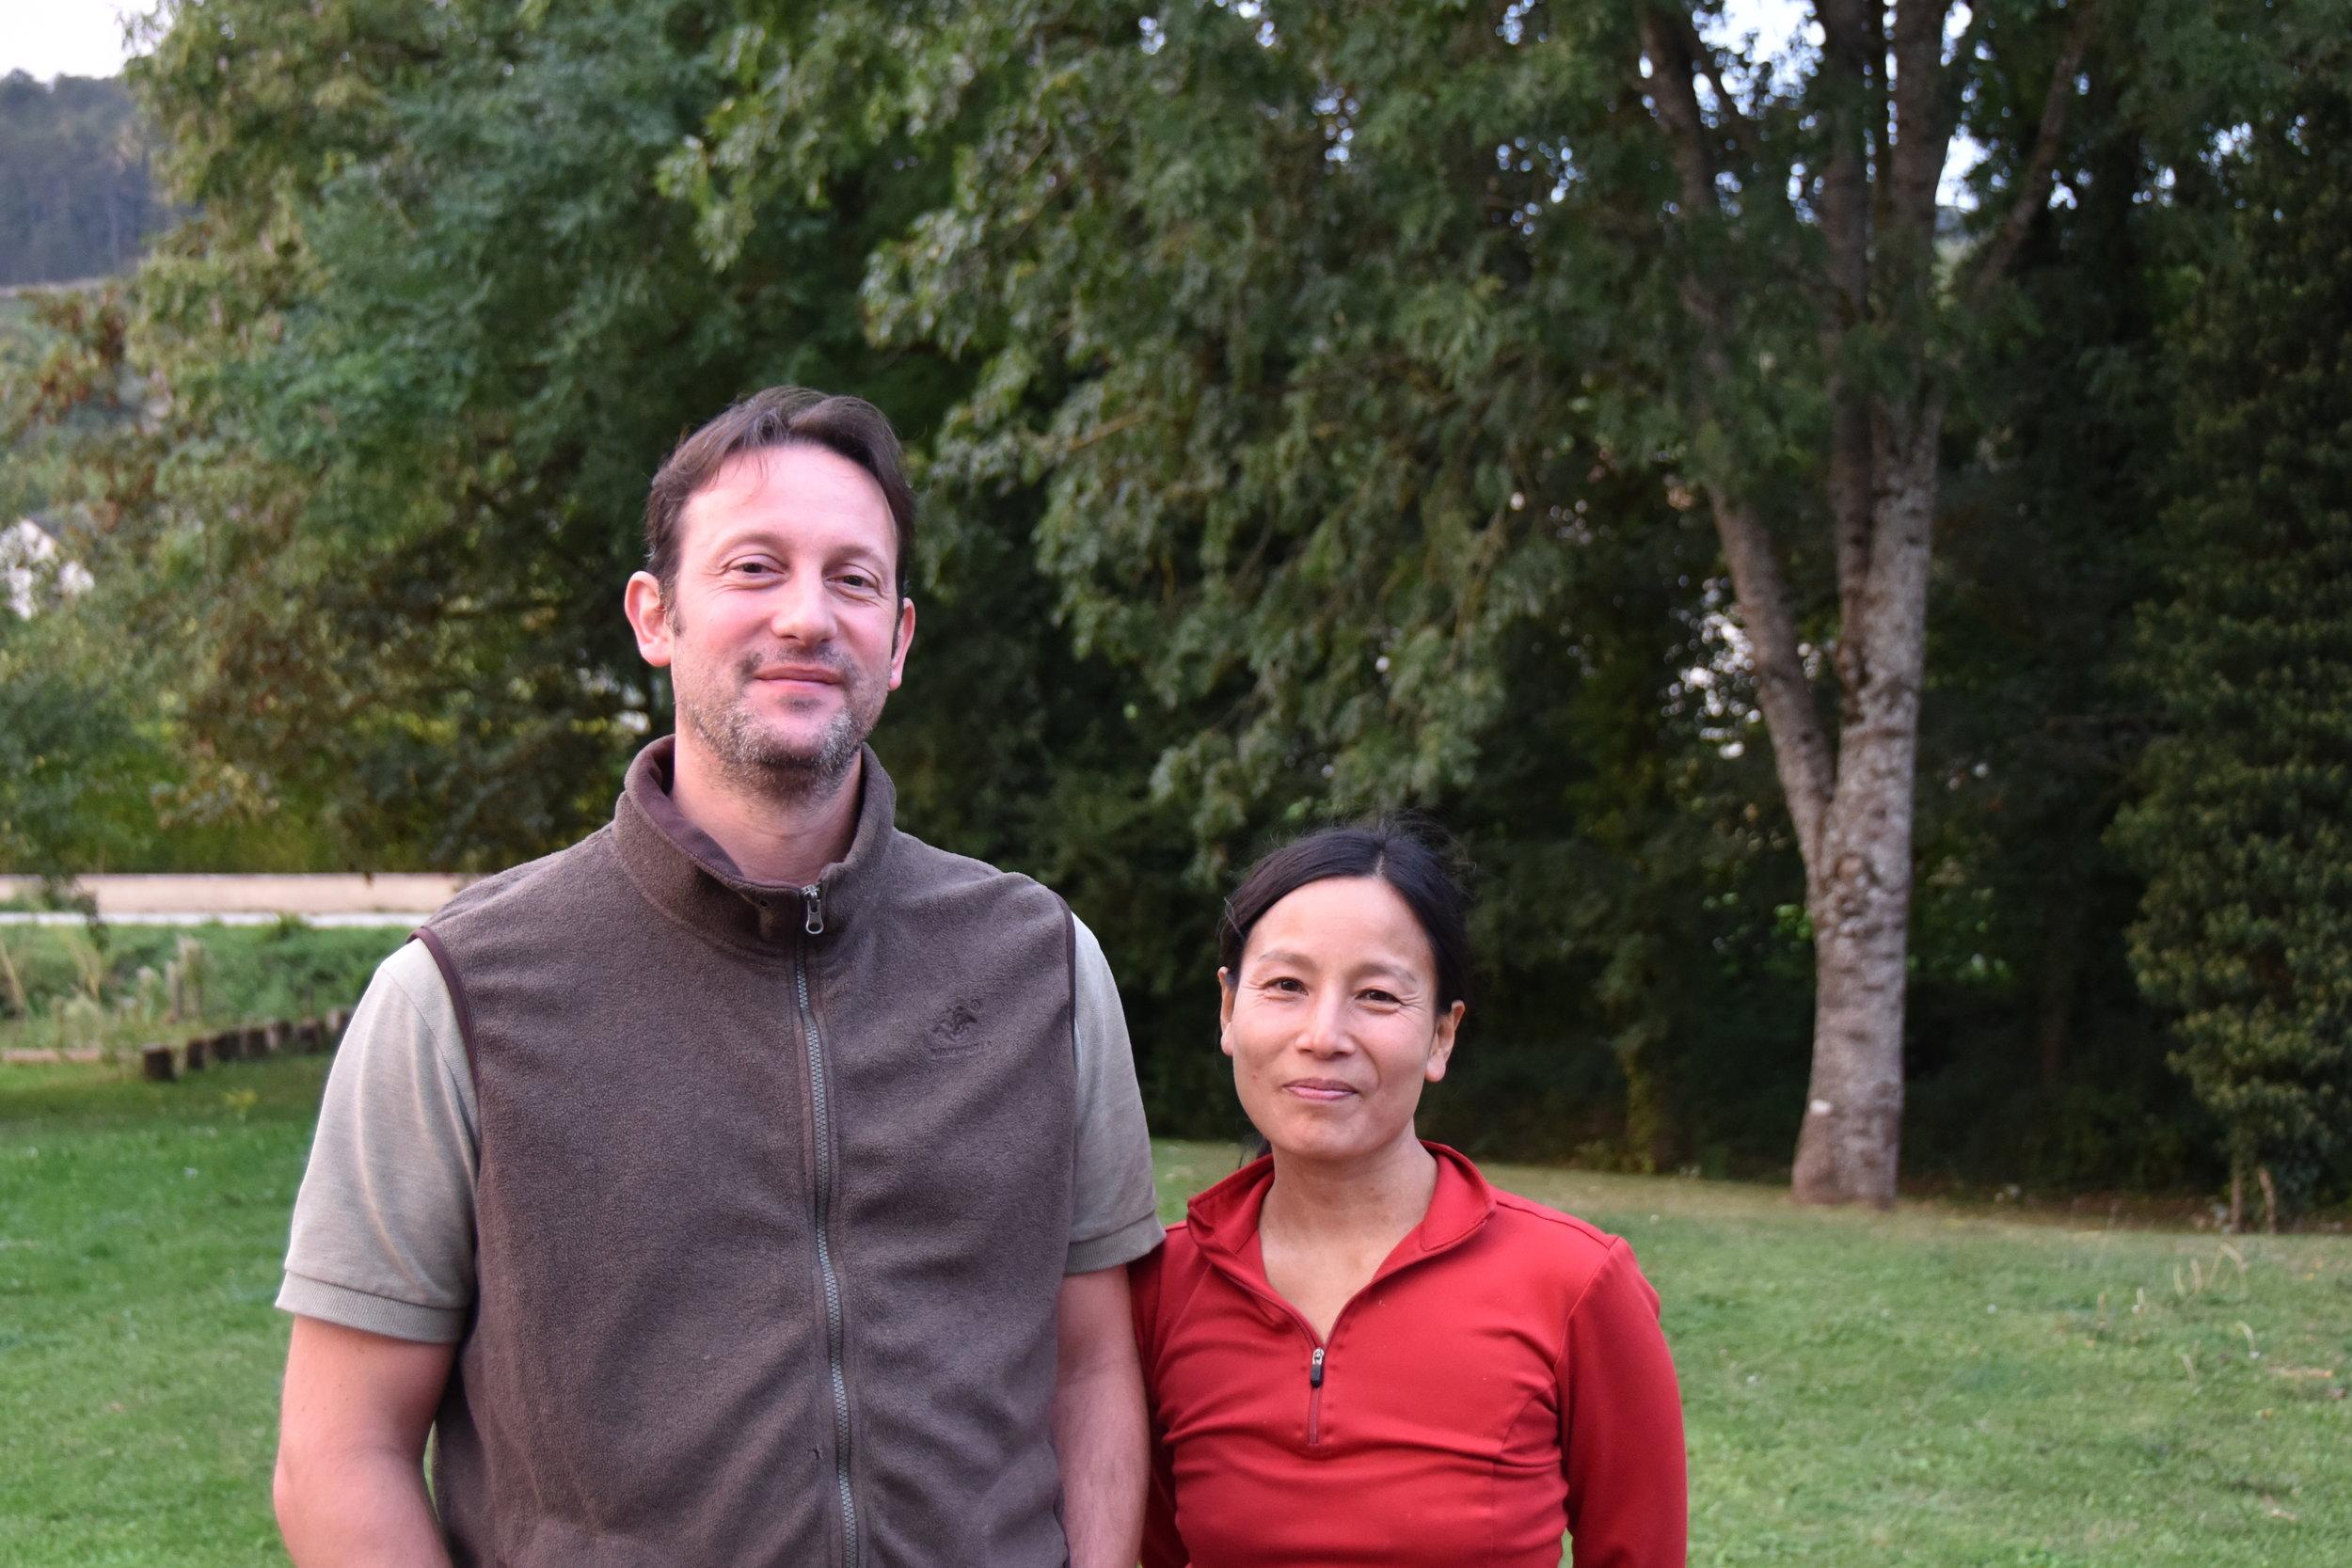 Guillaume Bott and Tomoko Kuriyama